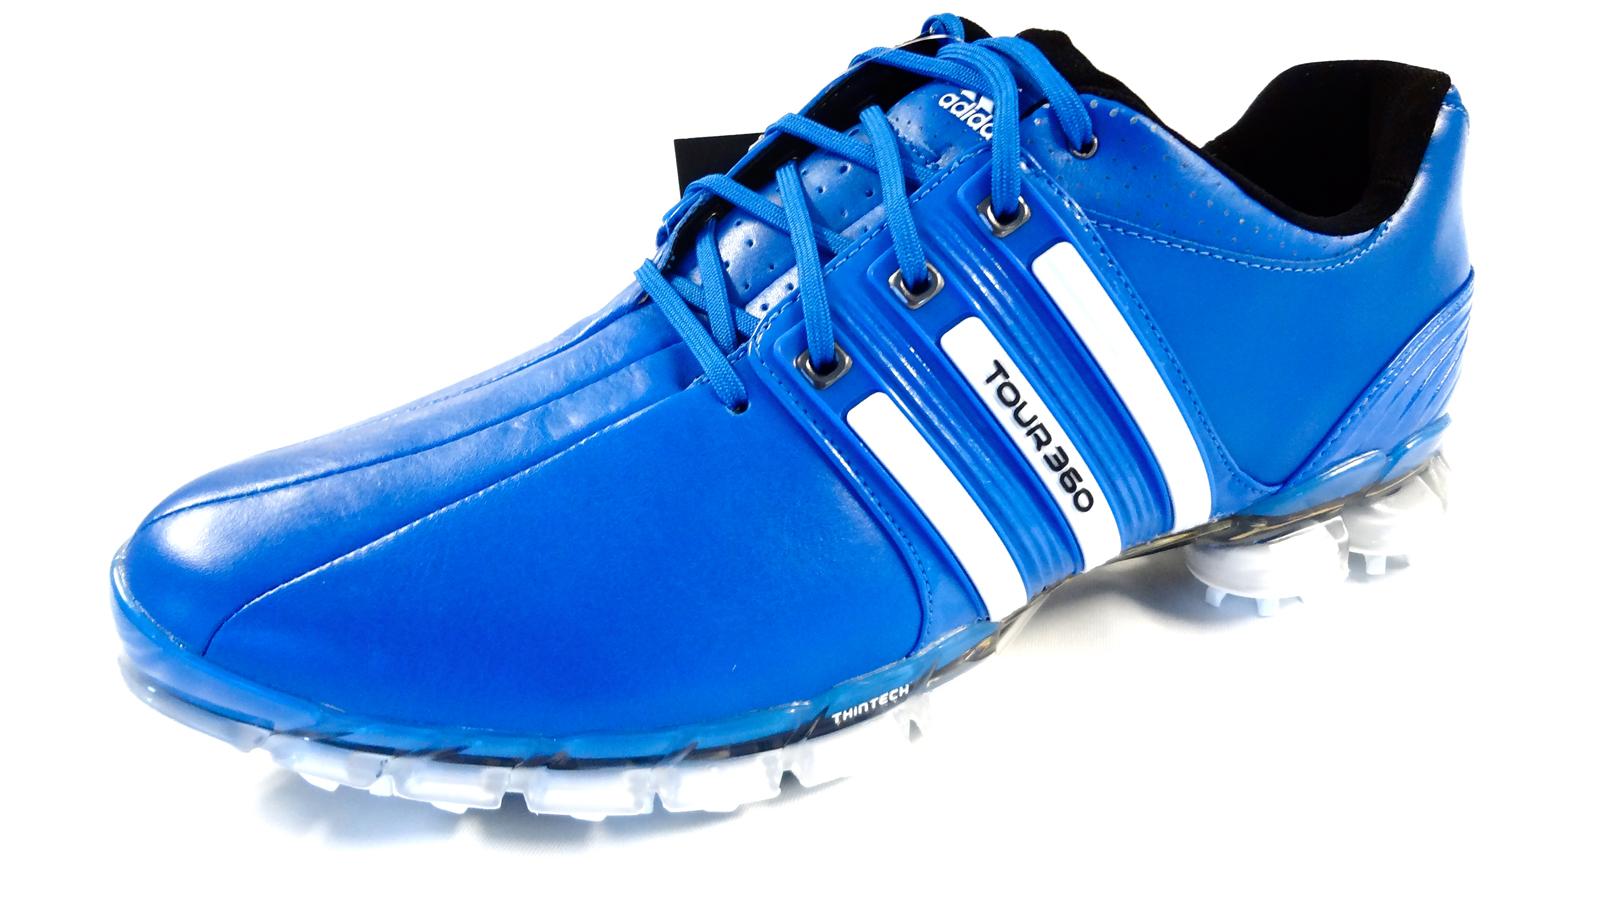 NEW Adidas Tour 360 ATV ROYAL BLUE/WHITE Size 8.5 M Golf Shoes